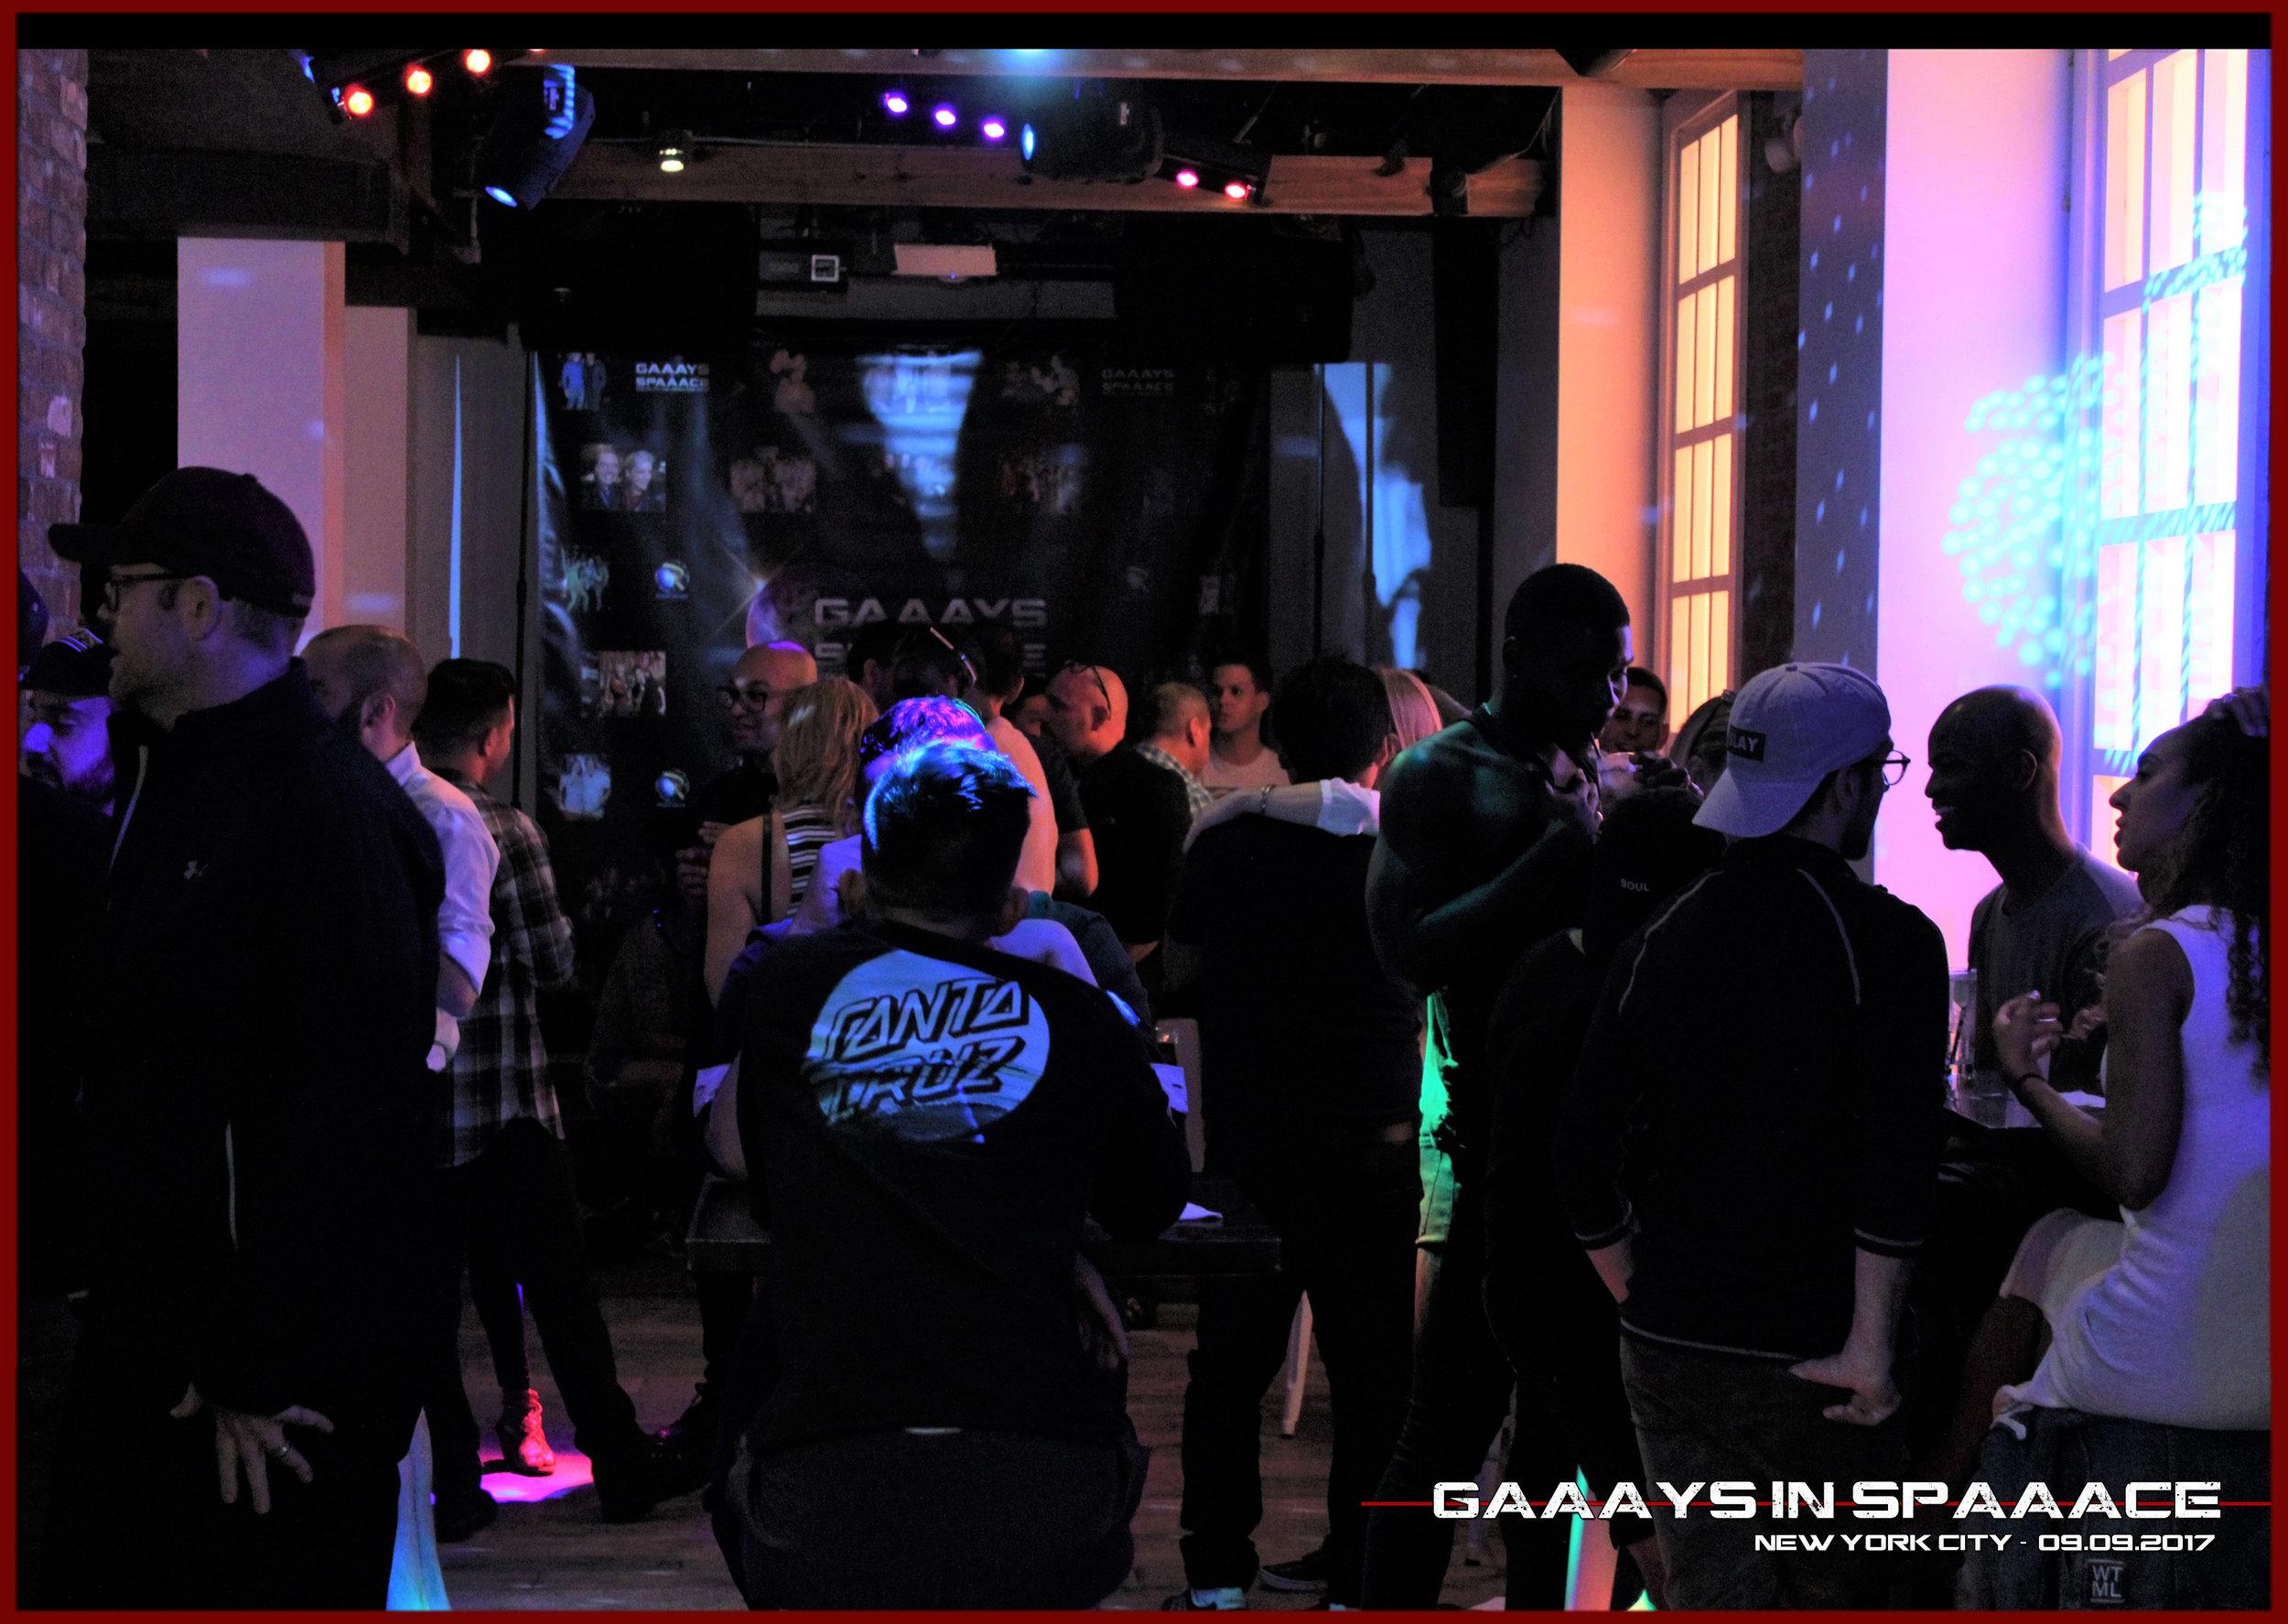 77-GIS-NYC-9-9-17-Audience-2.jpg